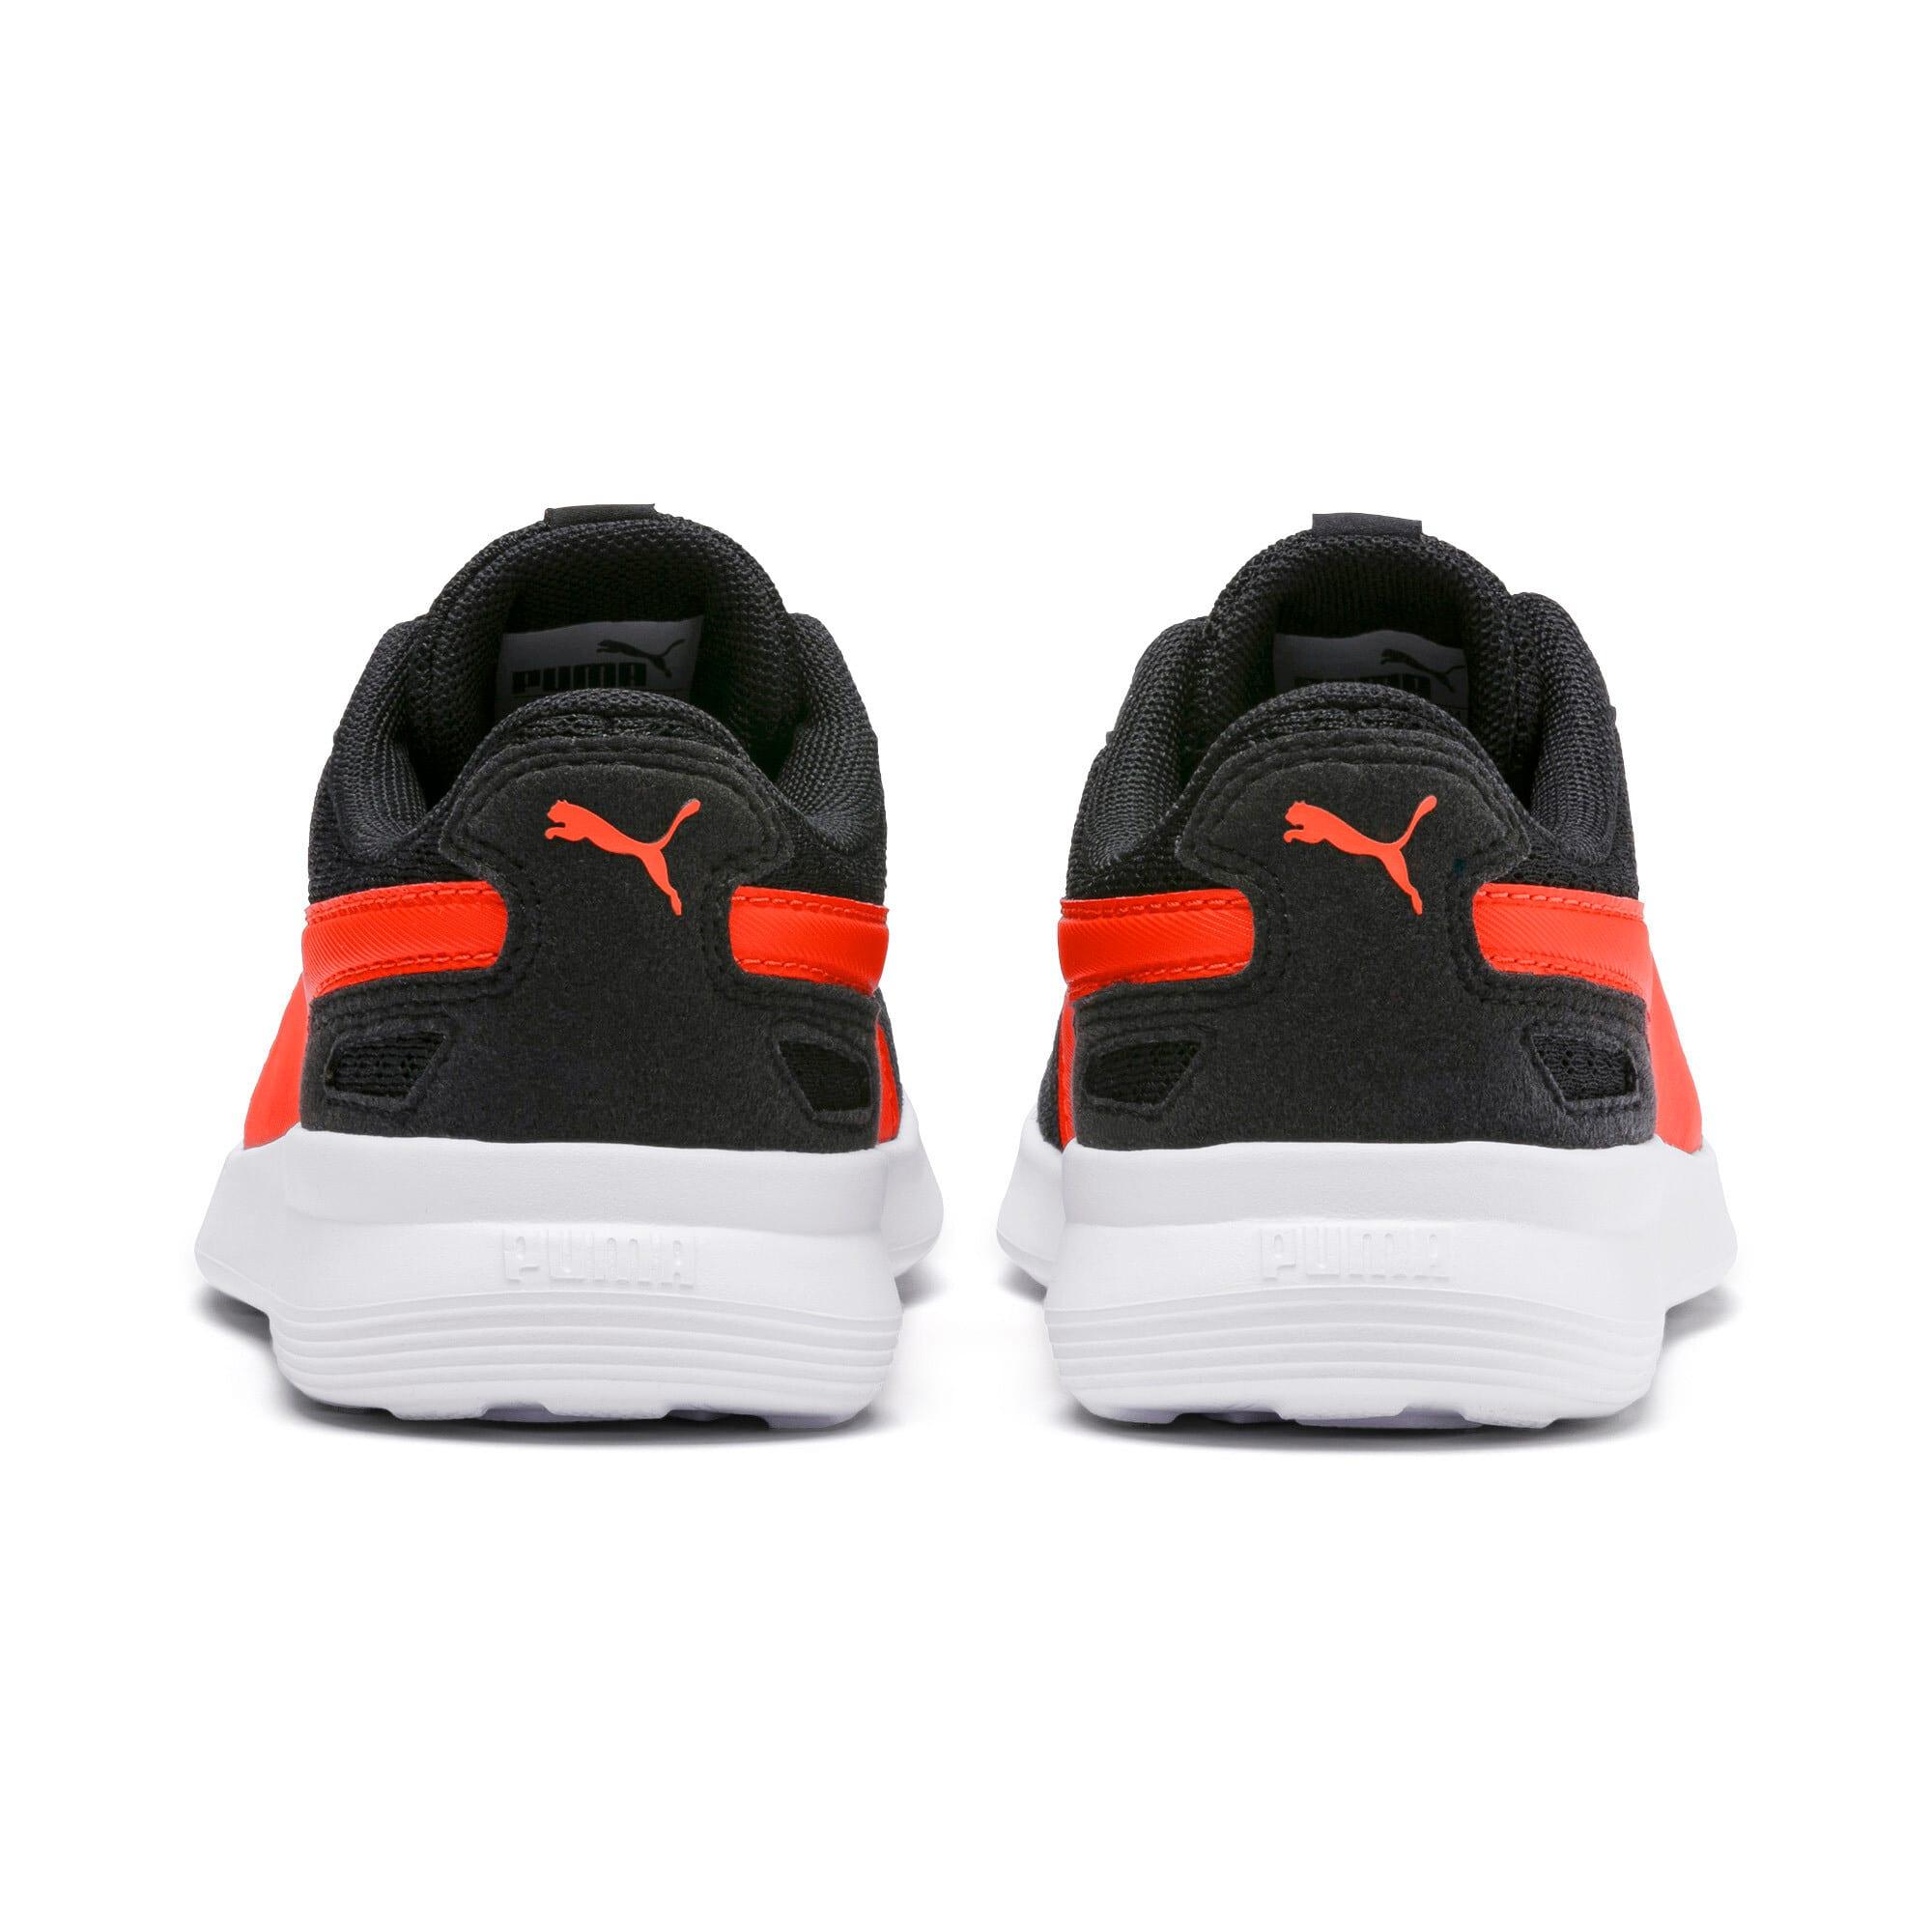 Thumbnail 4 of ST Activate Sneakers PS, Puma Black-Cherry Tomato, medium